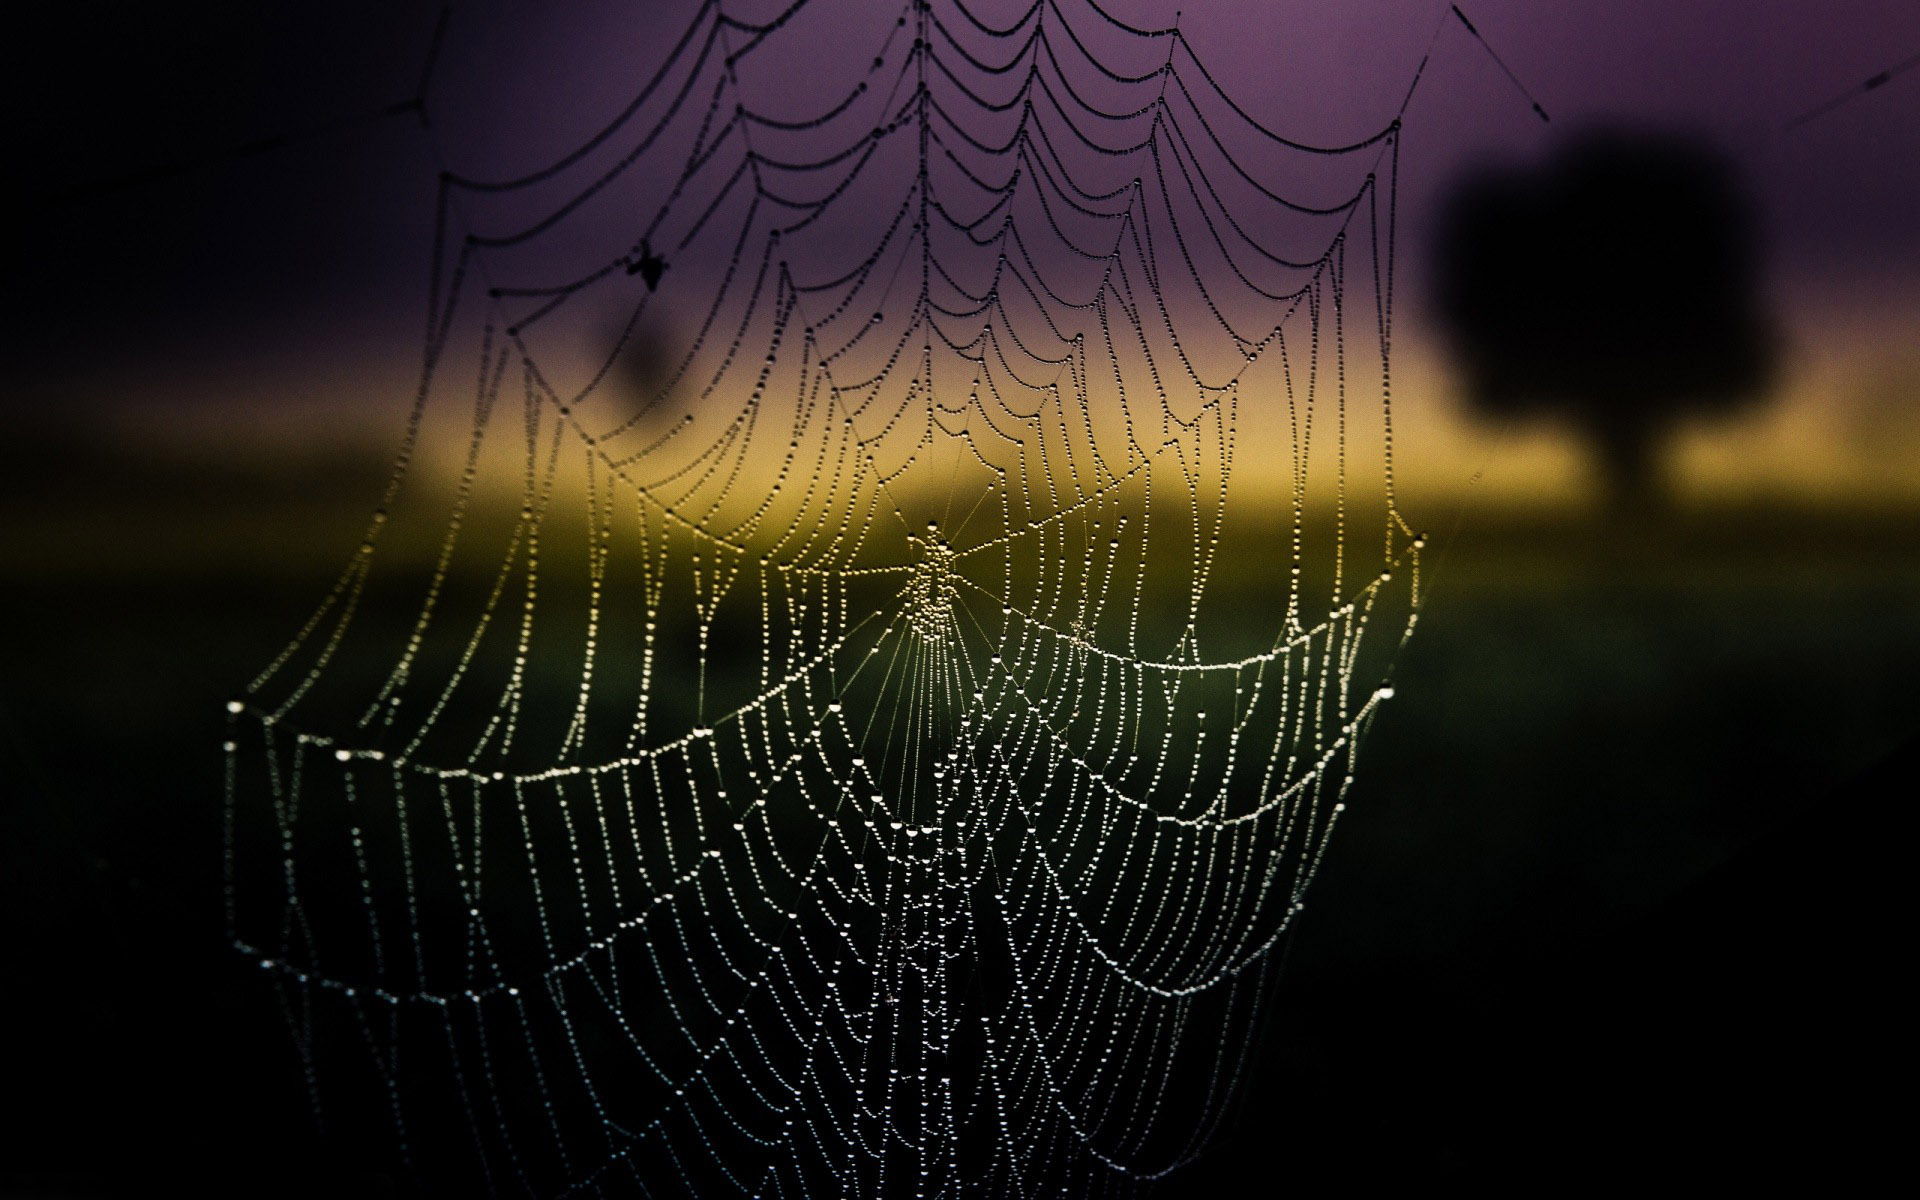 amazing spider web wallpaper 41576